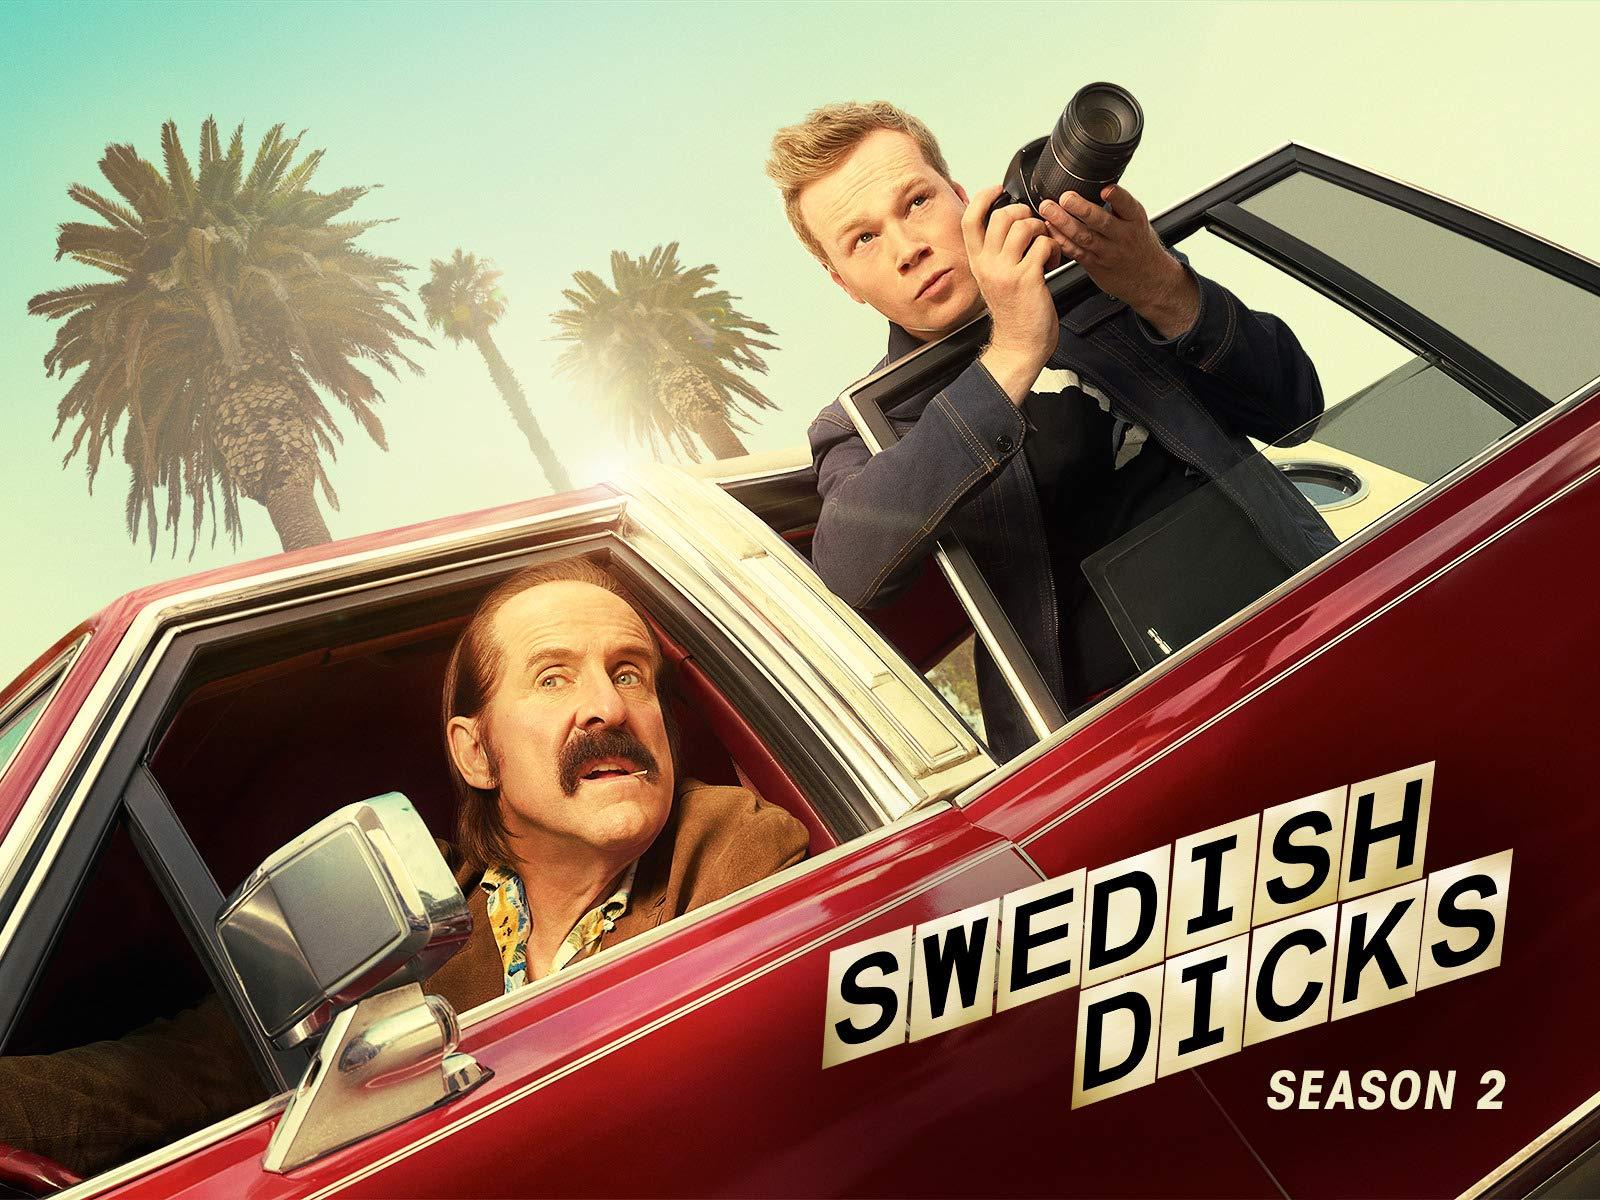 Swedish Dicks on Amazon Prime Video UK